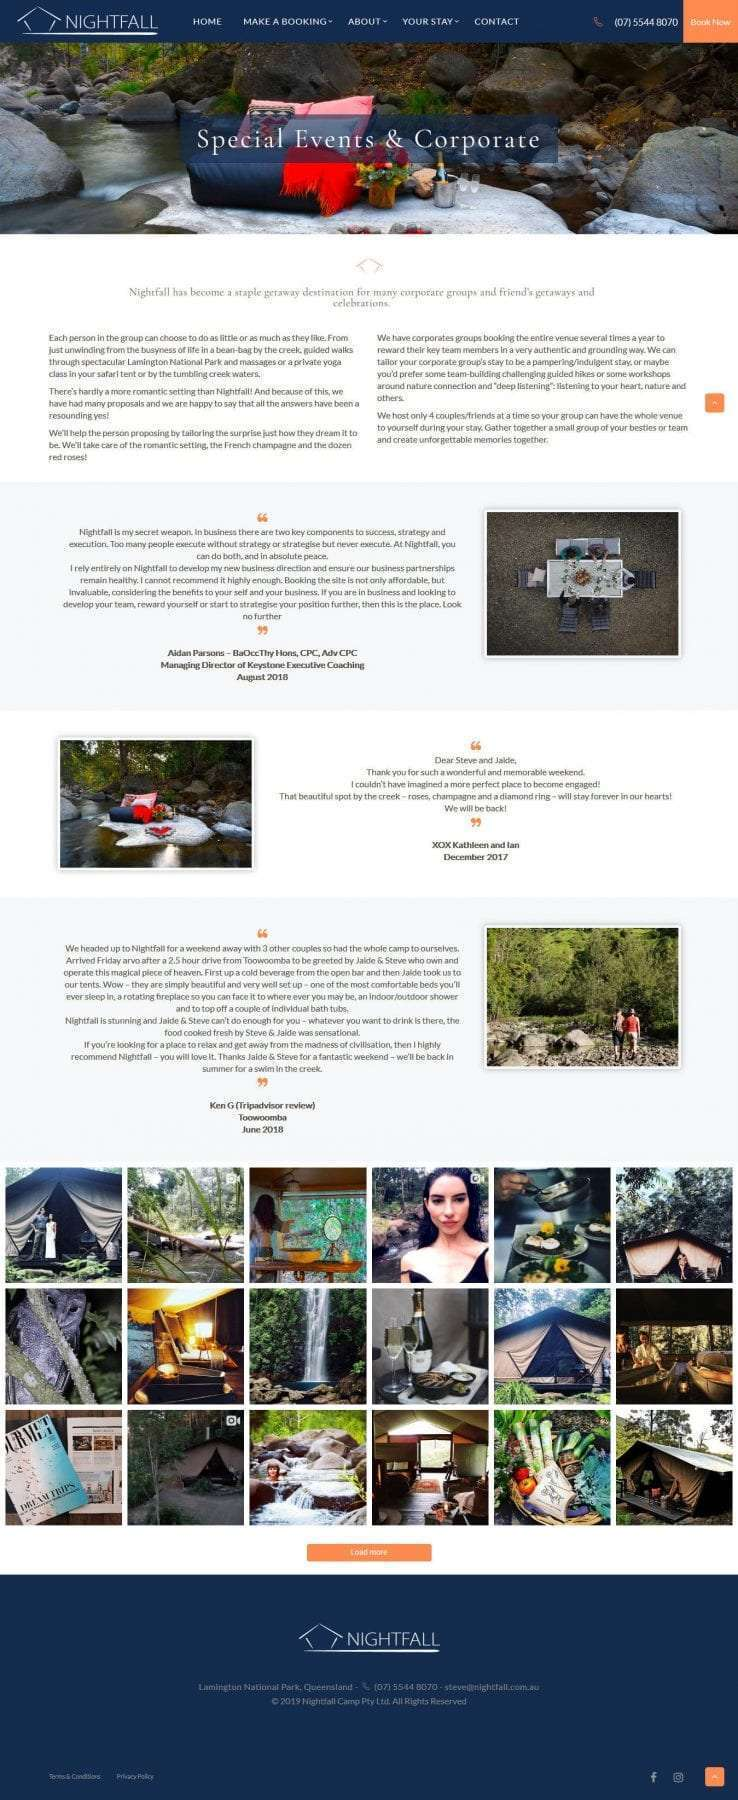 Nightfall events page